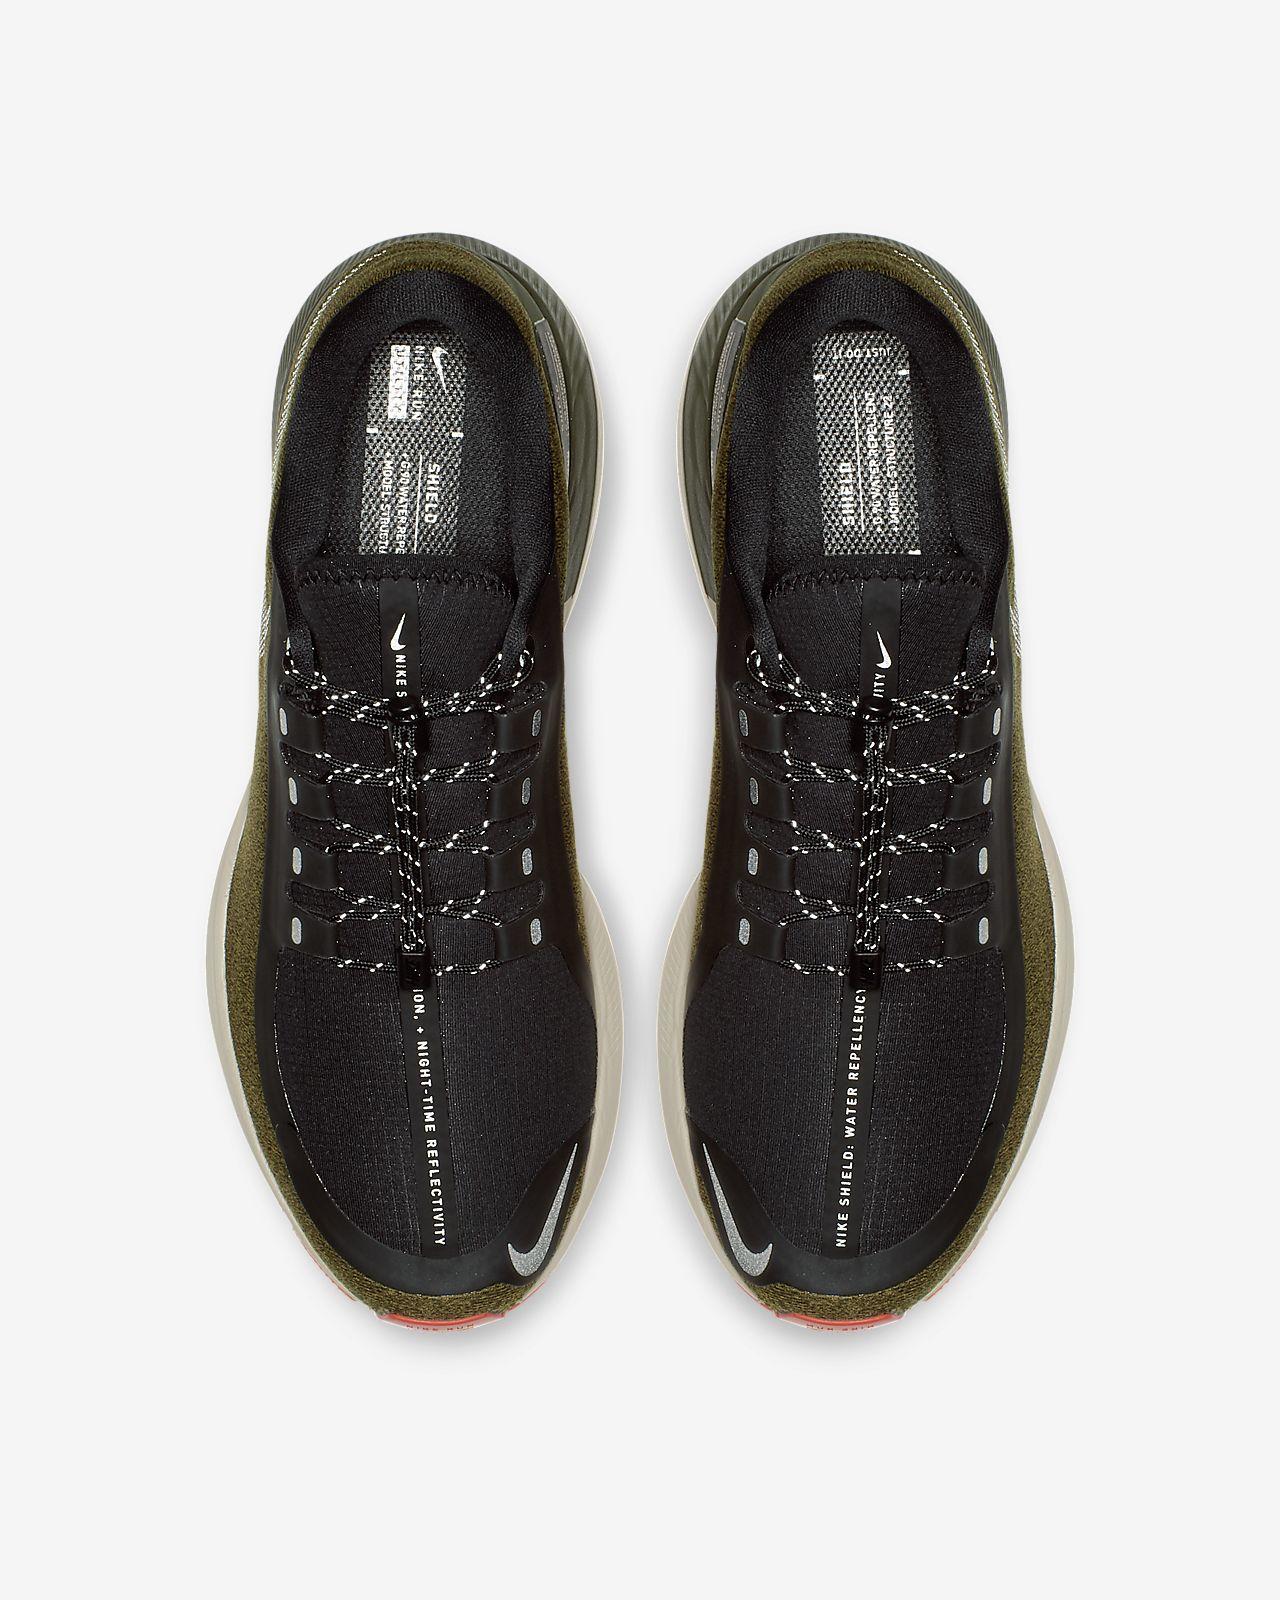 831c866d5d40 Nike Air Zoom Structure 22 Shield Water-Repellent Men s Running Shoe ...